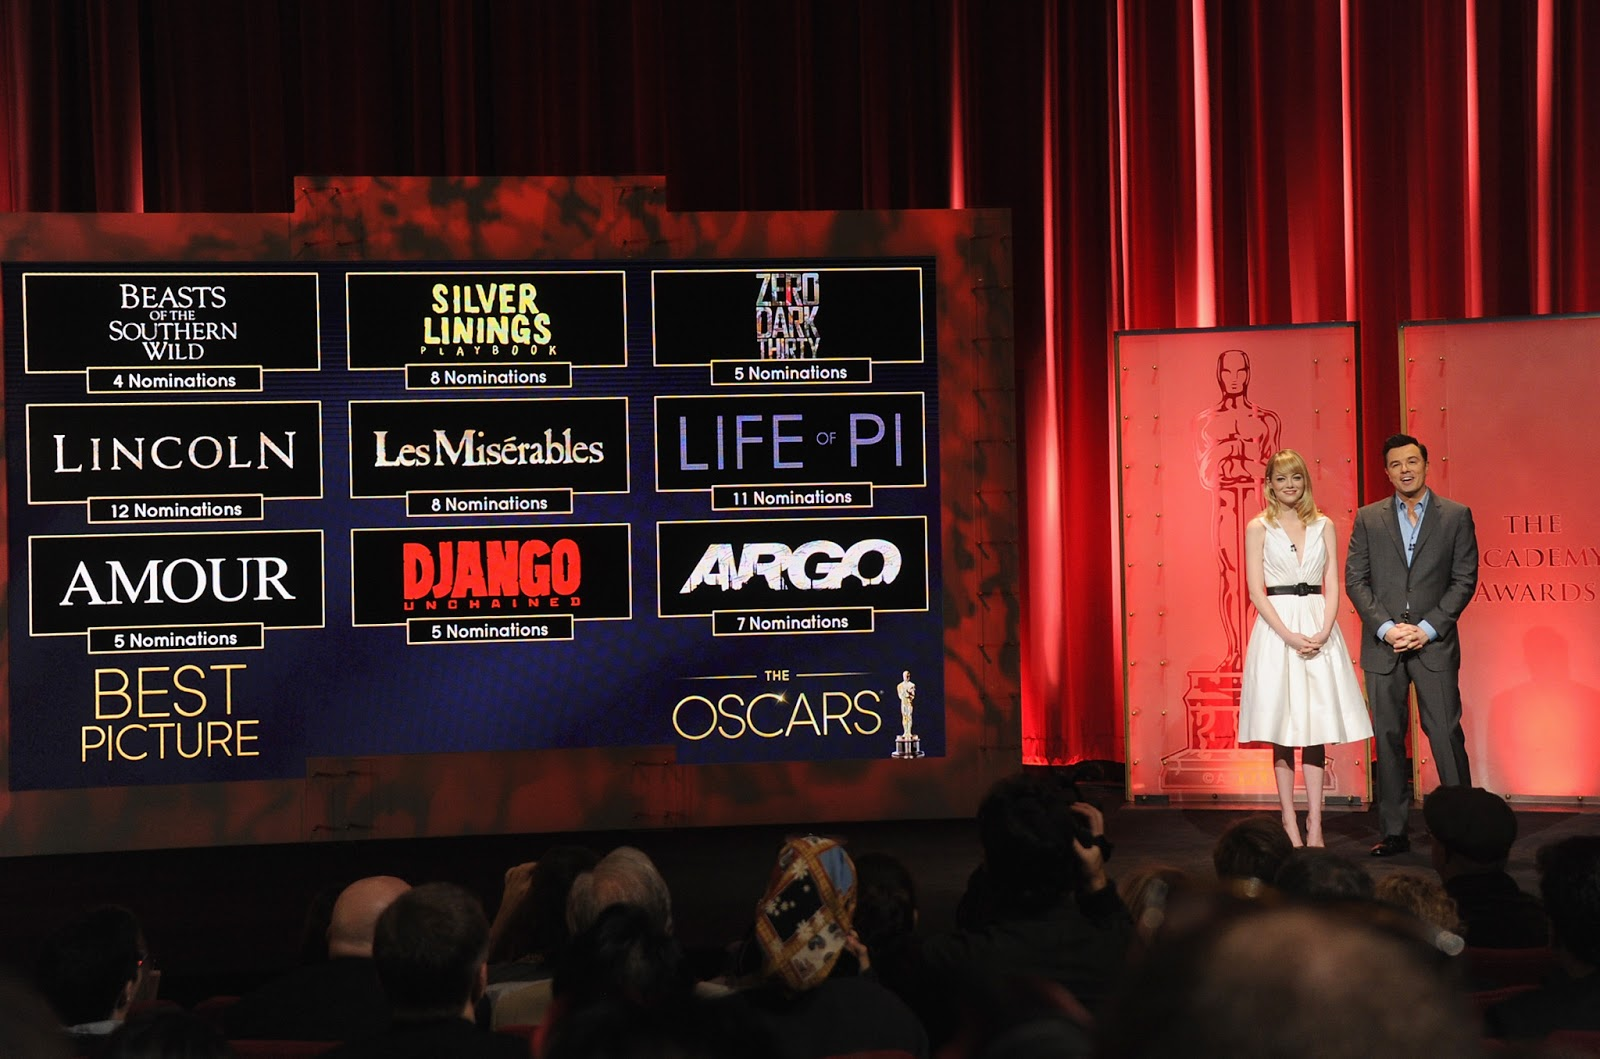 http://1.bp.blogspot.com/-NQr4c0vGwqg/USyE1UzCuDI/AAAAAAAADp0/IpZPkaWPOzs/s1600/2013-oscar-nominations-01102013-01.jpg